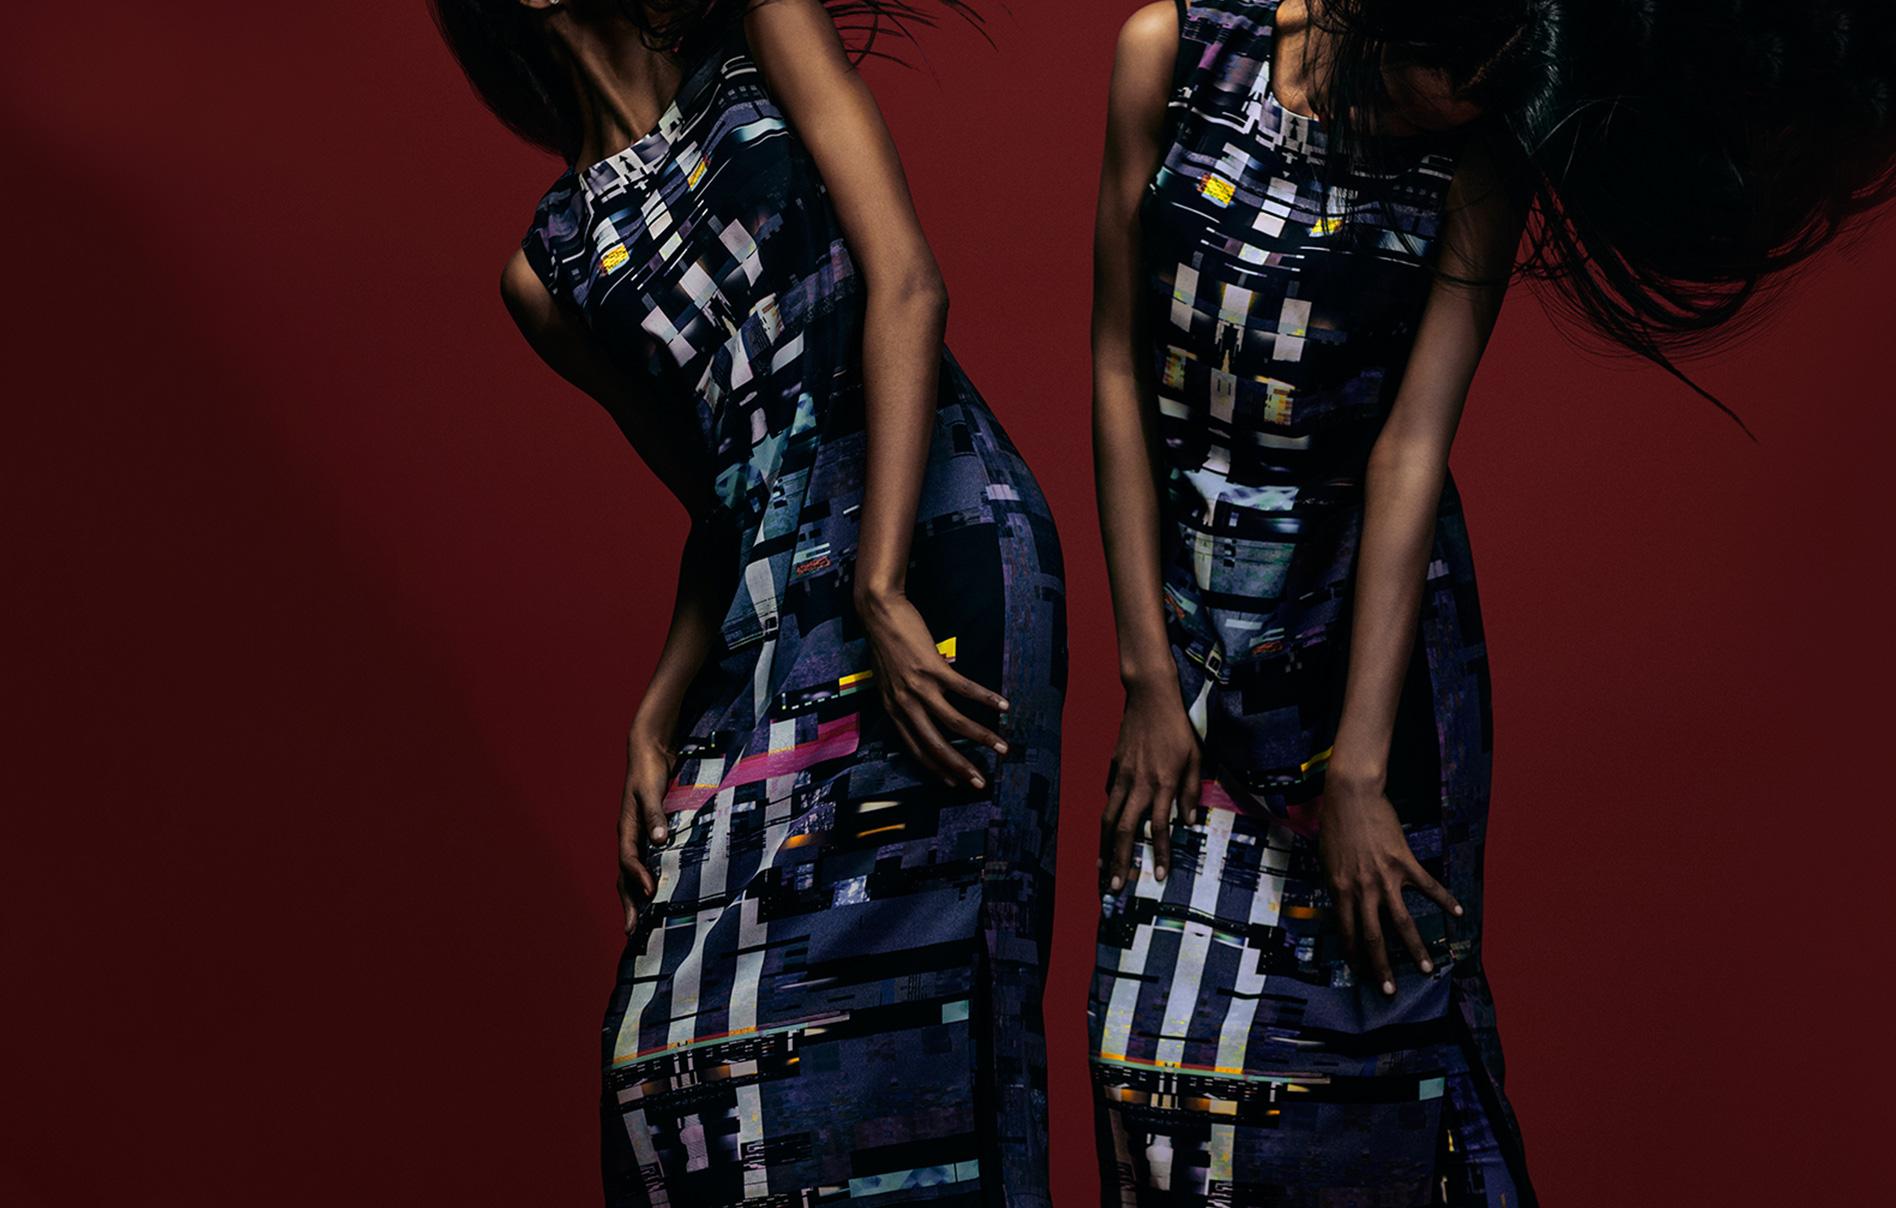 thais-lima-glitch-dress-1.jpg